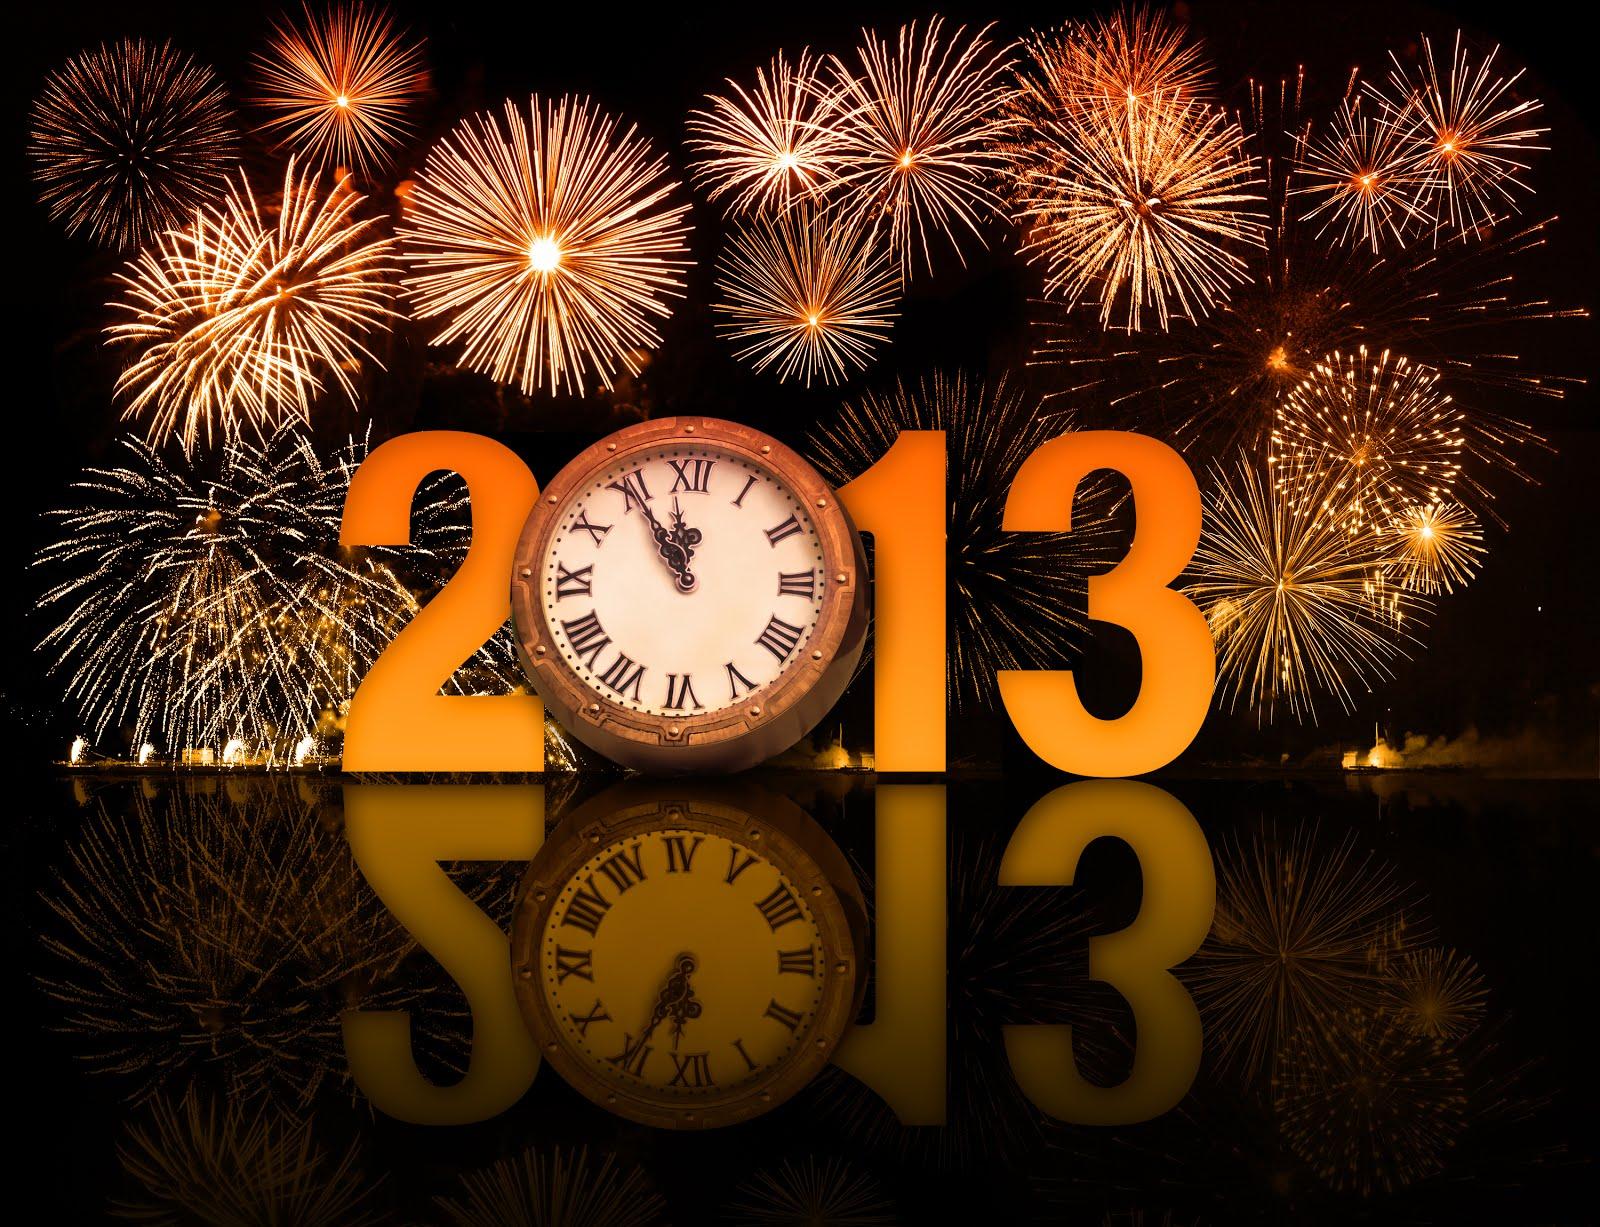 5, 4, 3, 2, 1… FELIZ ANO NOVOOOO! 2013 Chegou!